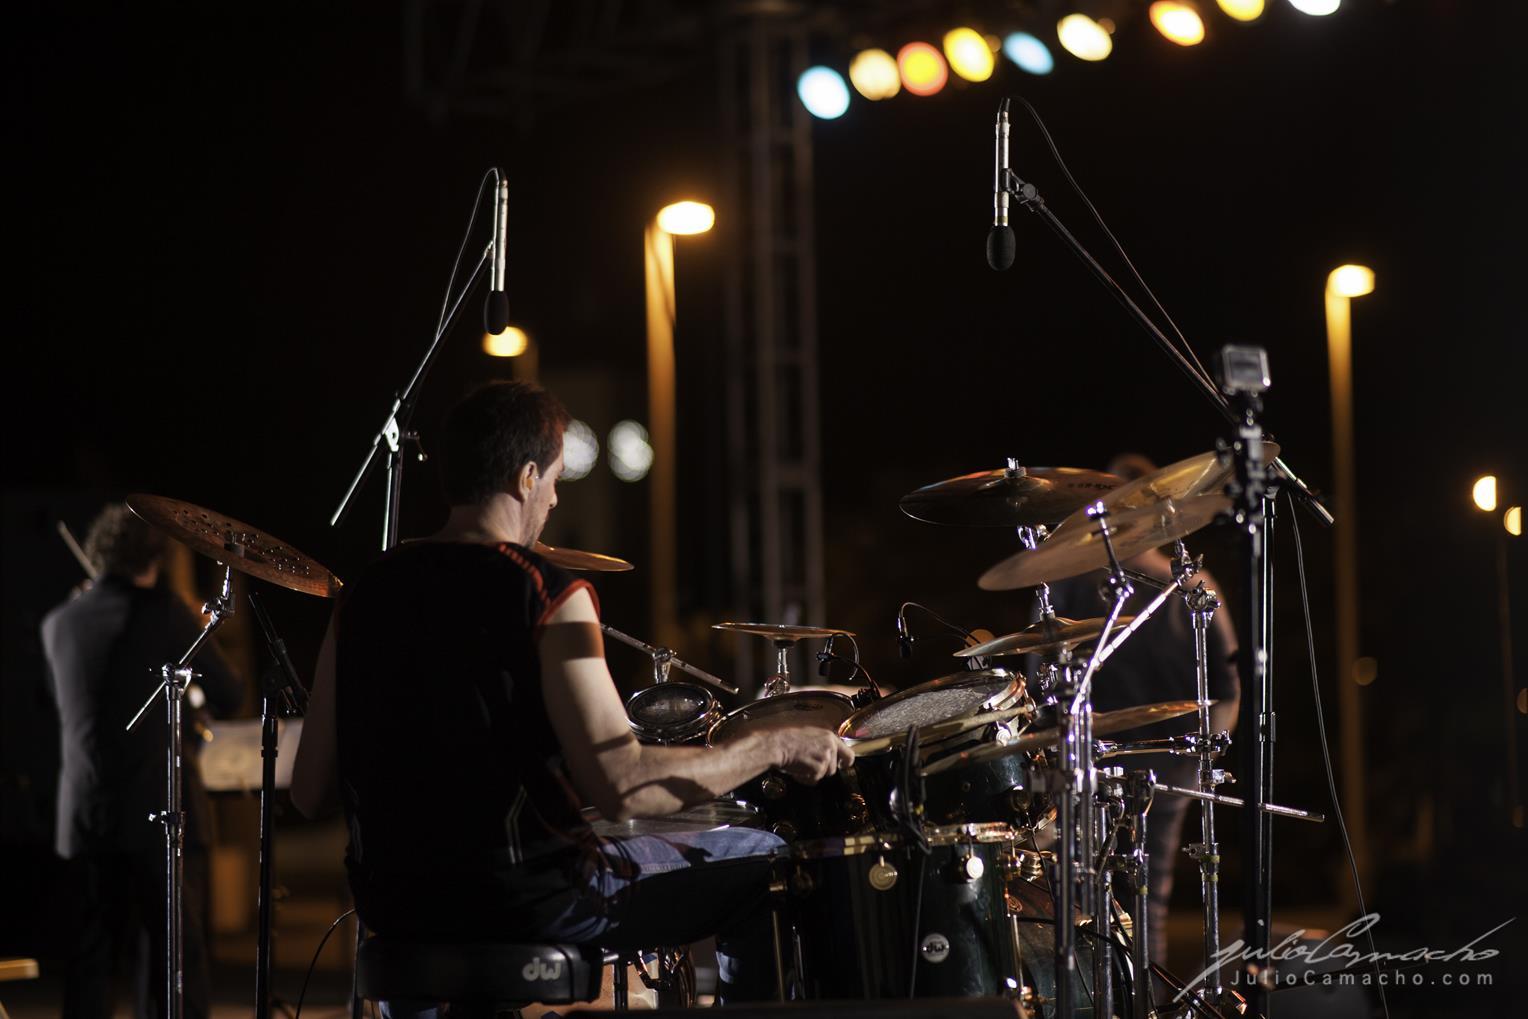 2014-10-30 31 CAST TOUR Ensenada y Tijuana - 0655 - www.Juli (Copy).jpg